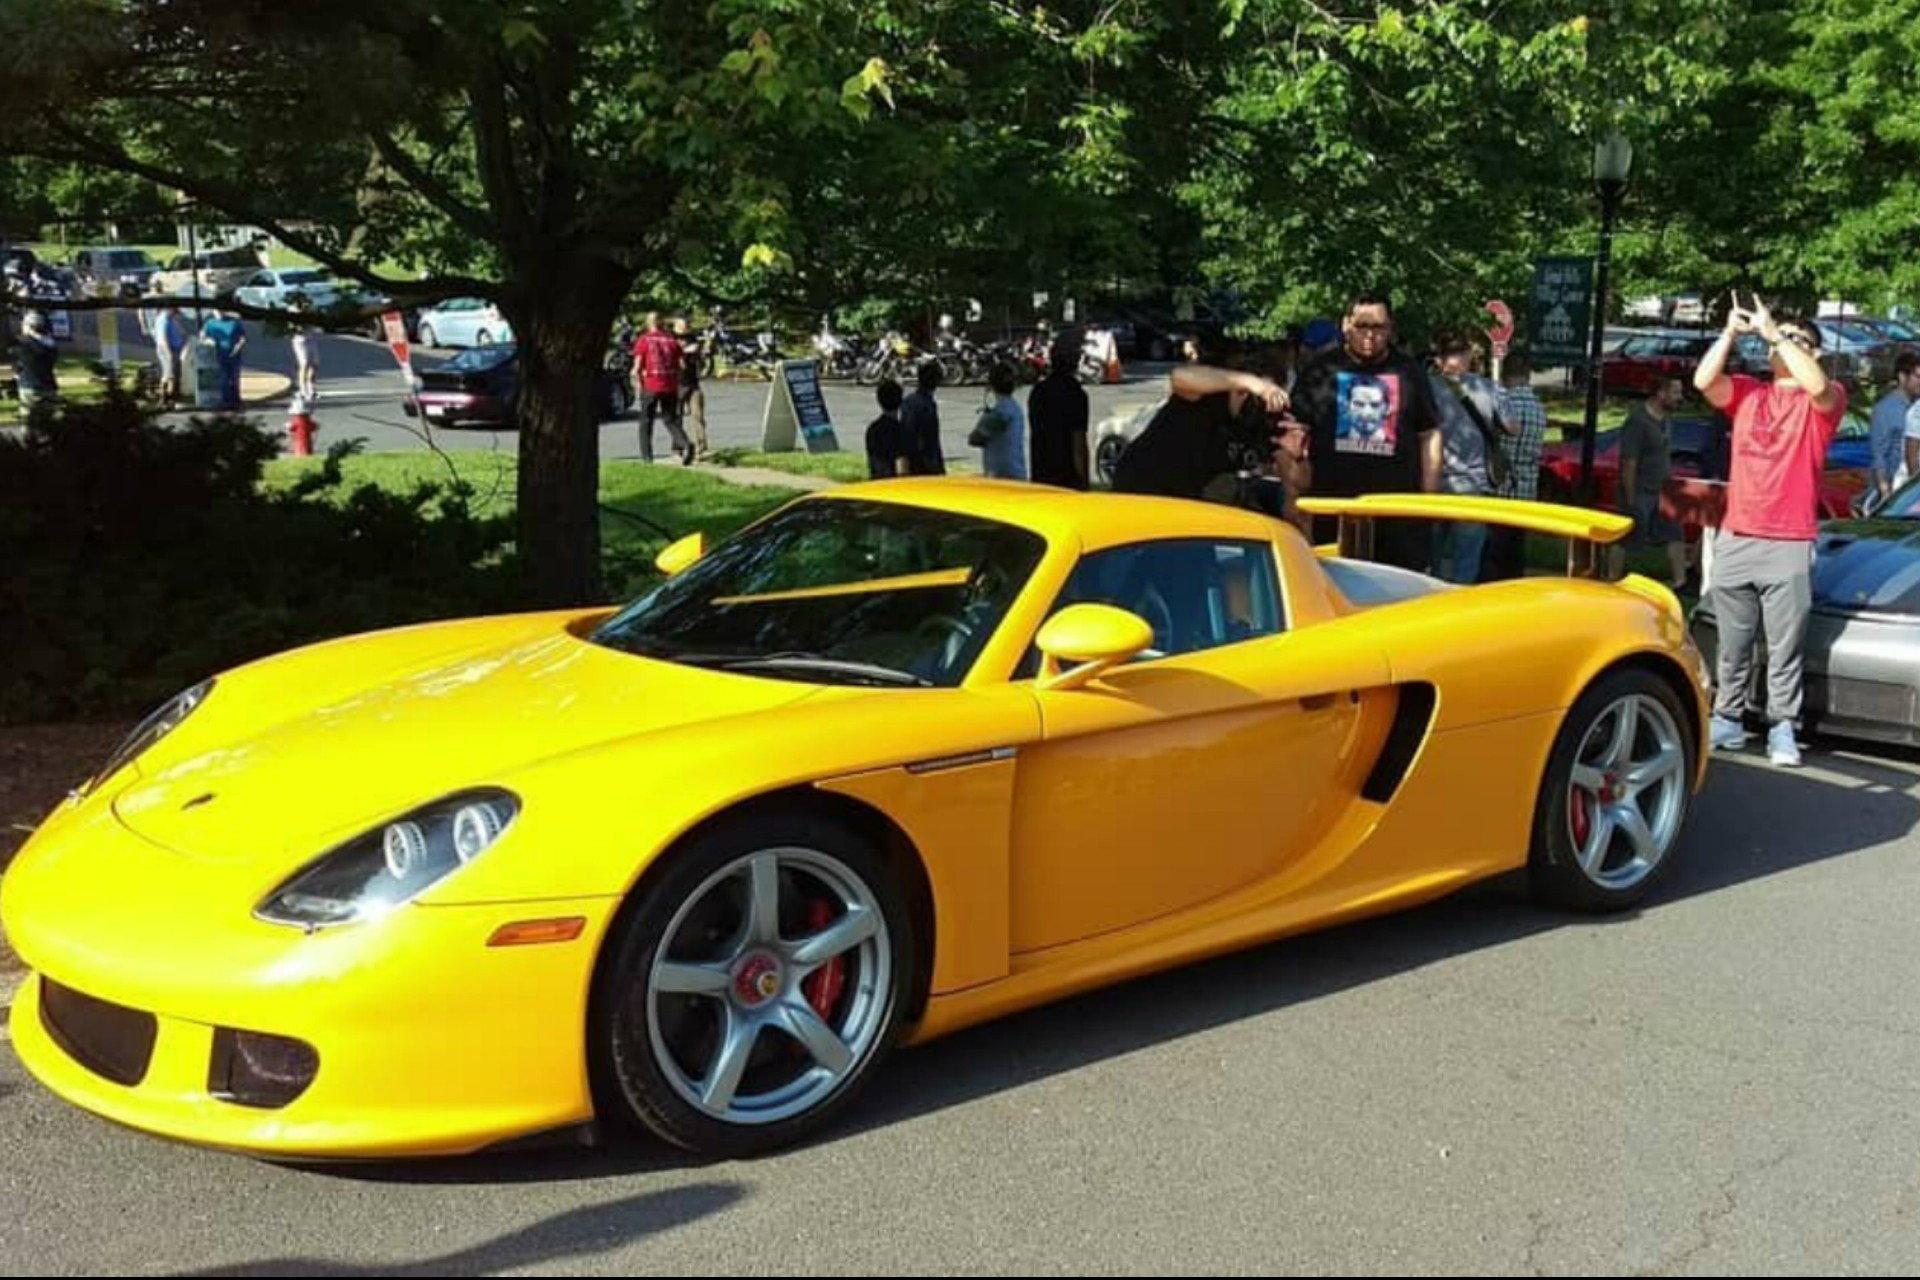 Naked Carrera GT - 6SpeedOnline - Porsche Forum and Luxury